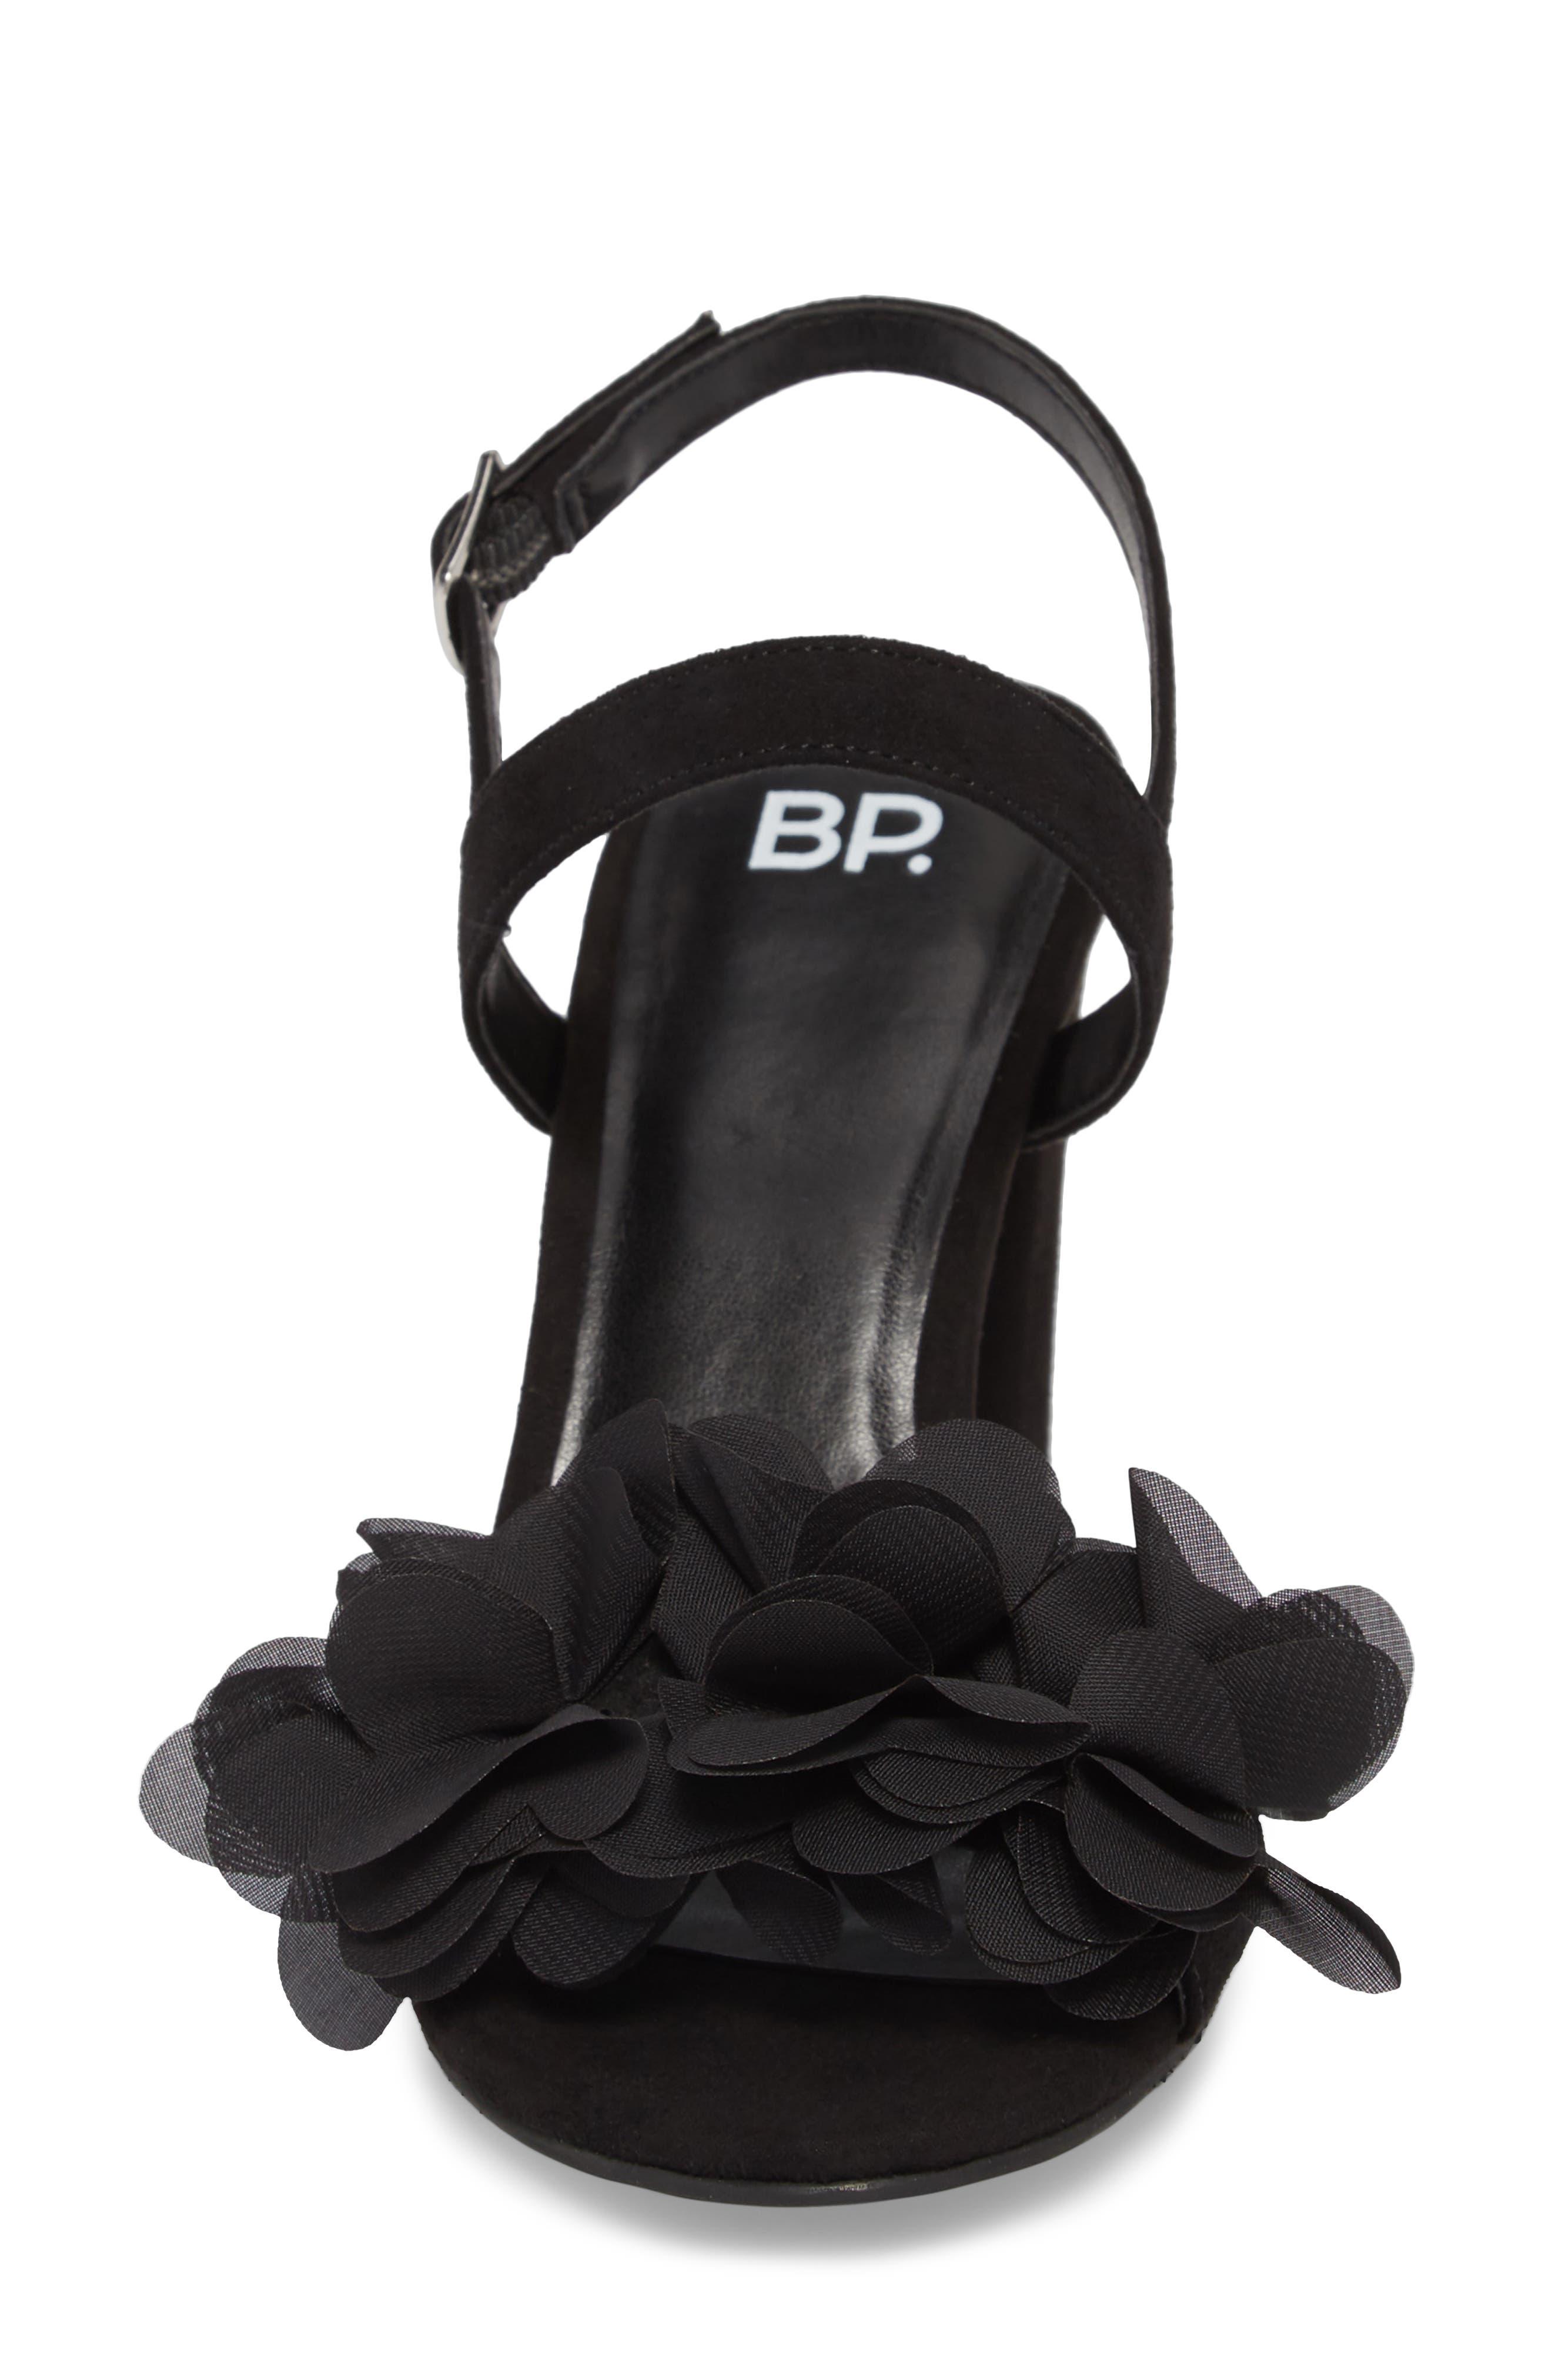 Lula Block Heel Slingback Sandal,                             Alternate thumbnail 4, color,                             BLACK FLOWERS FABRIC